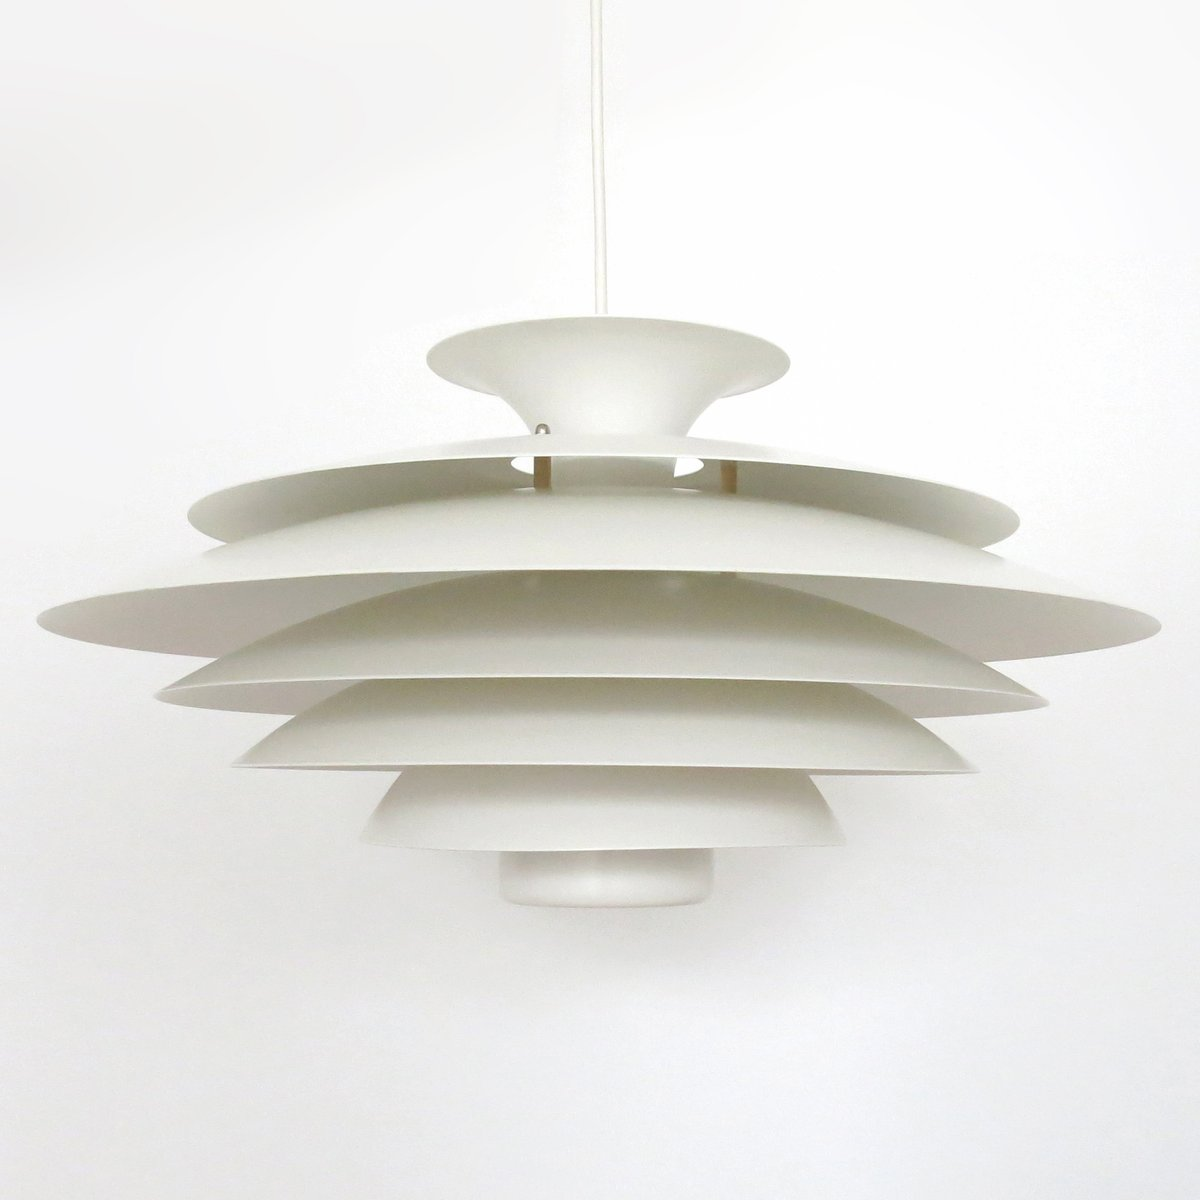 Danish Modern Layered Pendant Lamp From Formlight 1960s